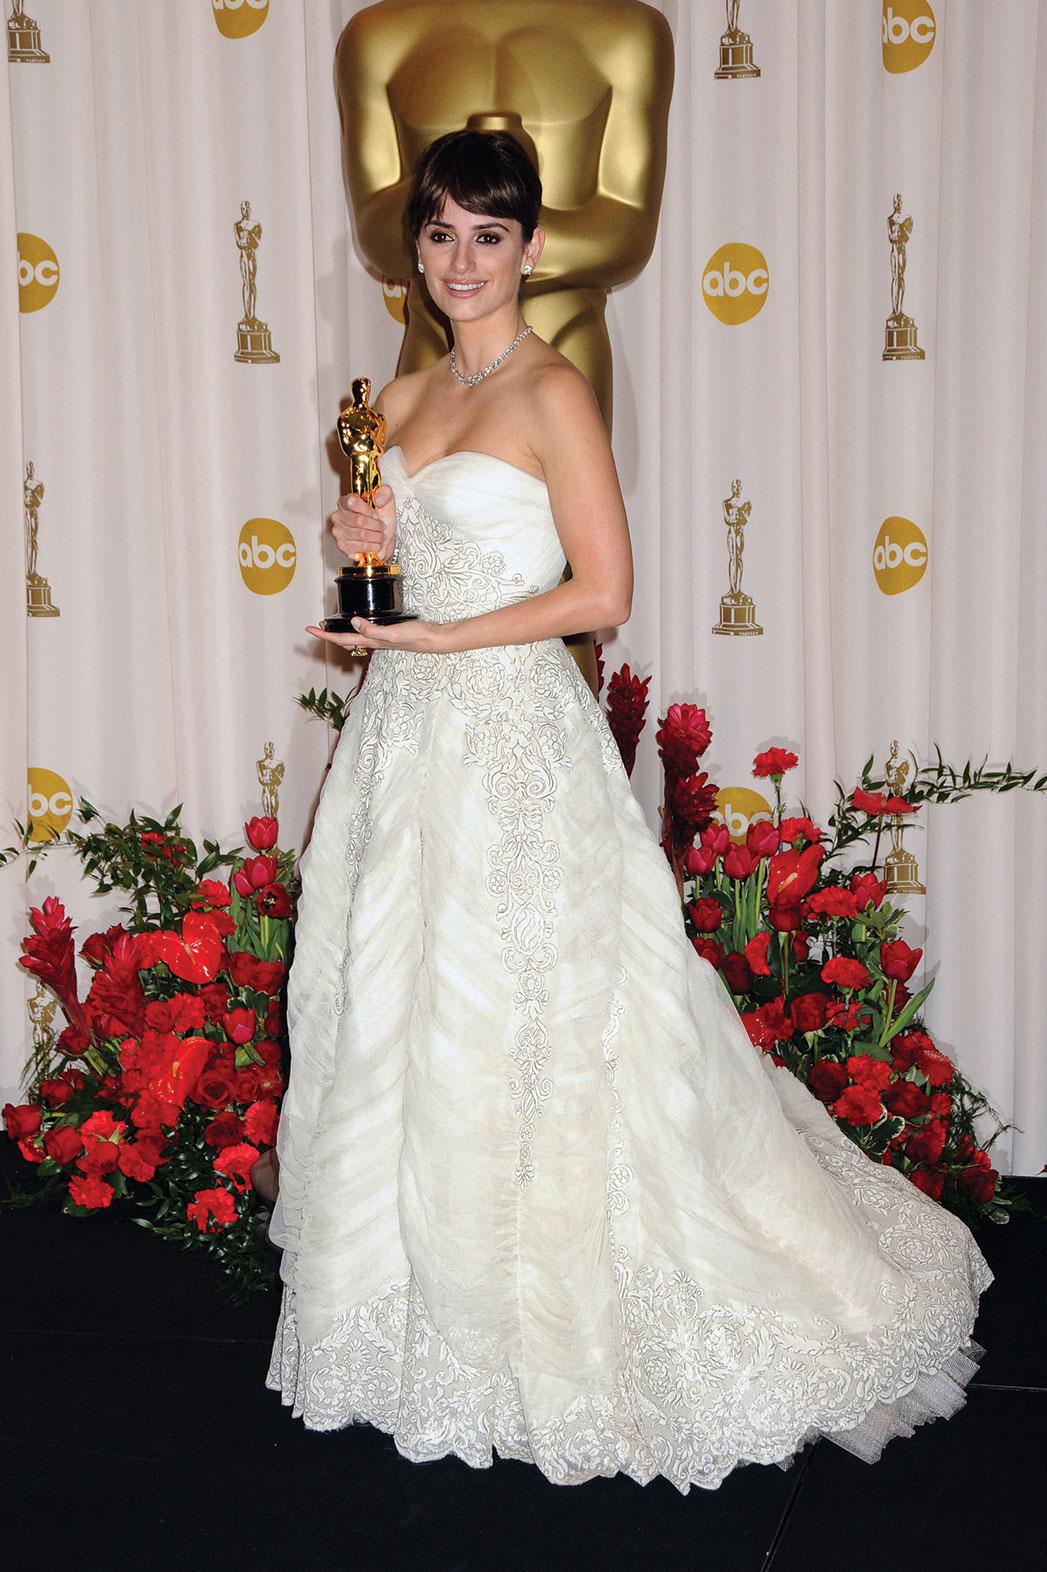 White Hot (25% of Oscar Winners)